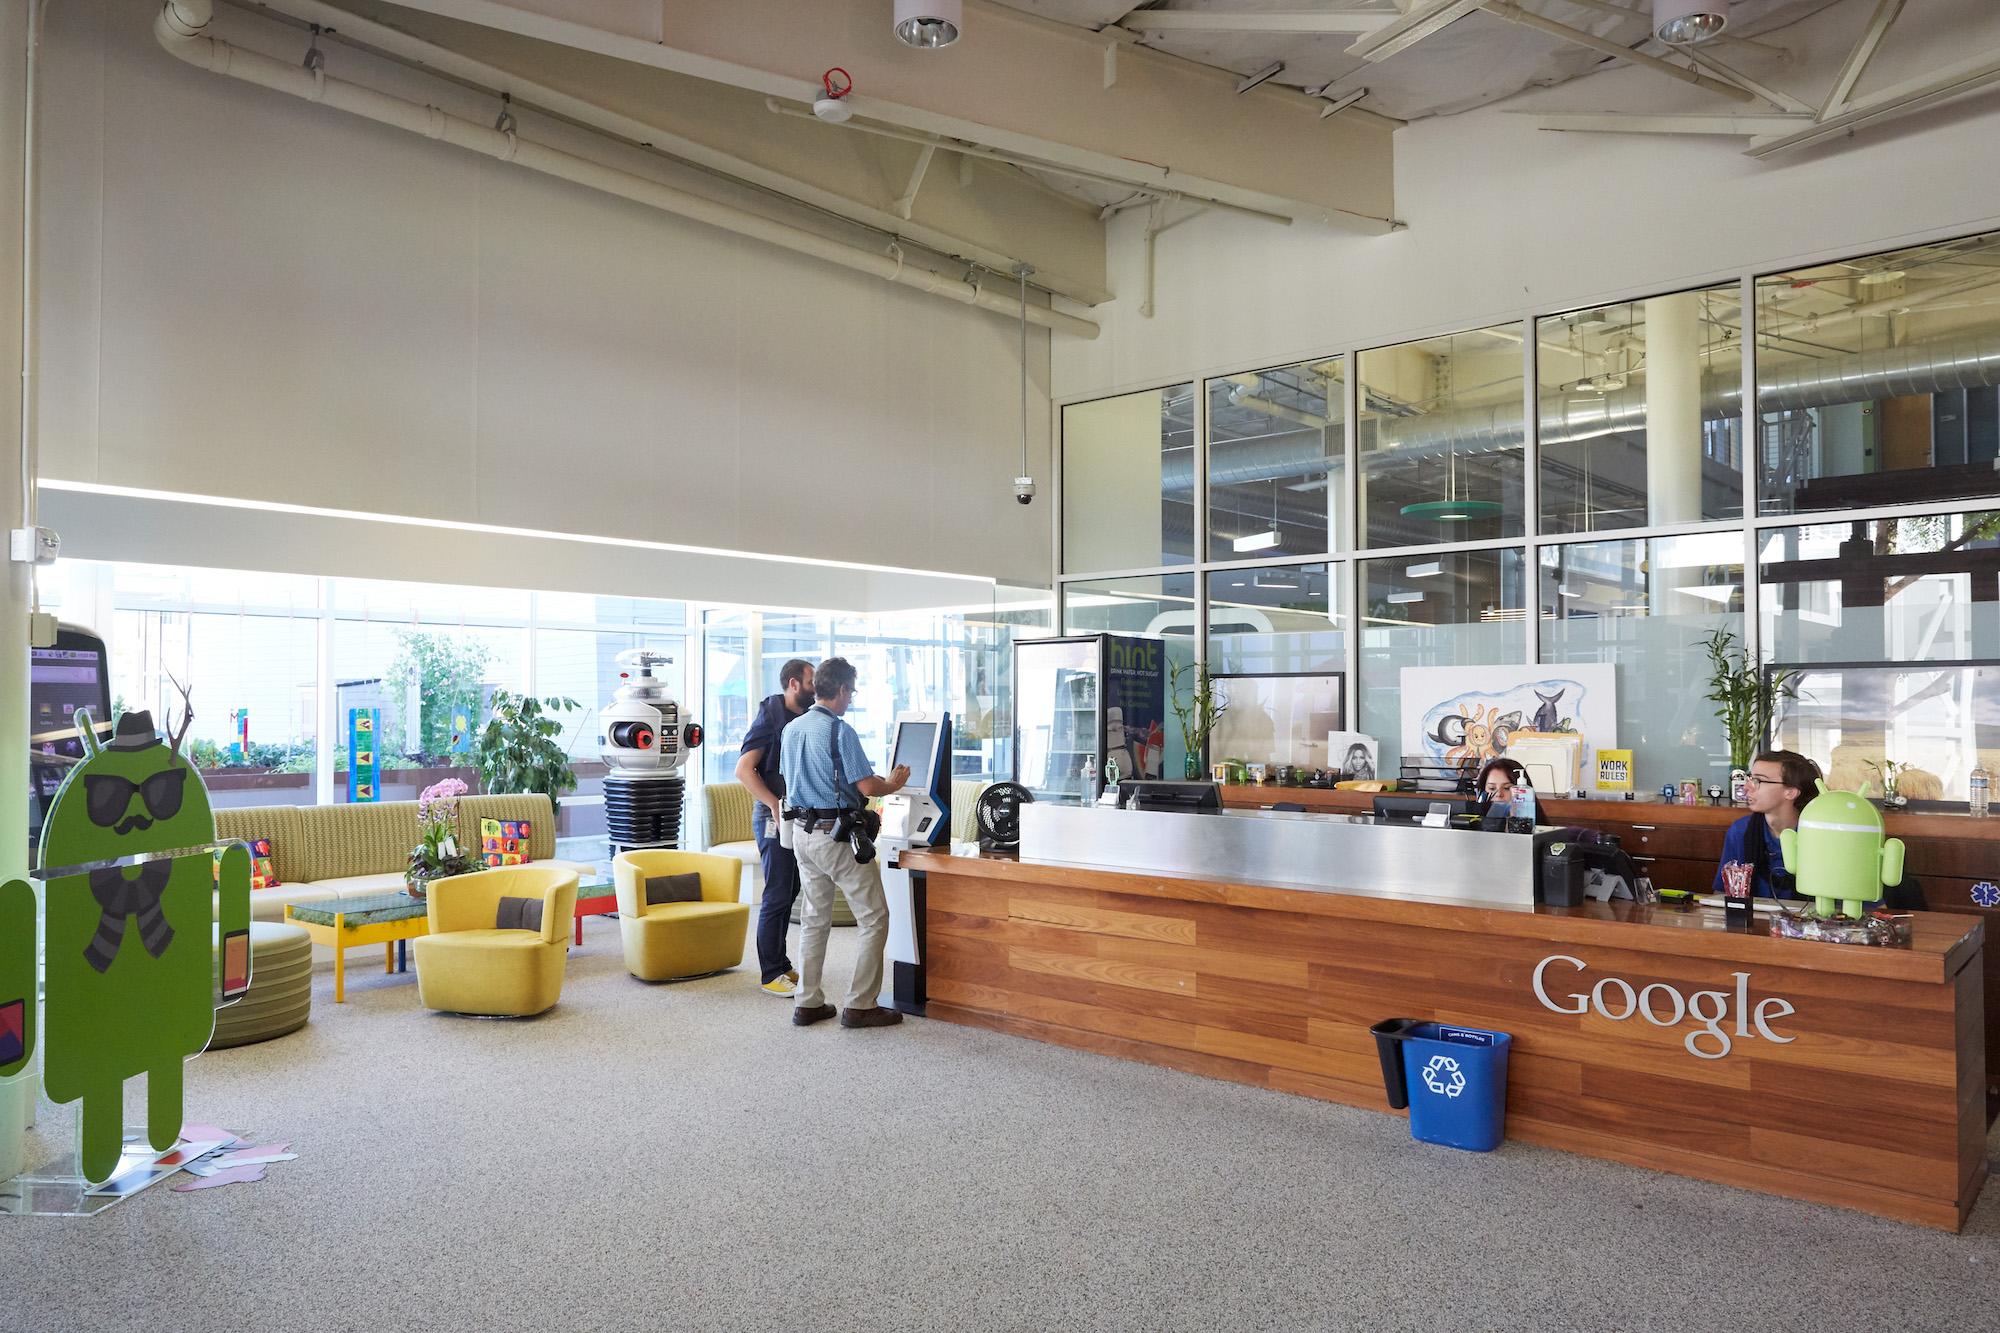 One of Google's lobbies.